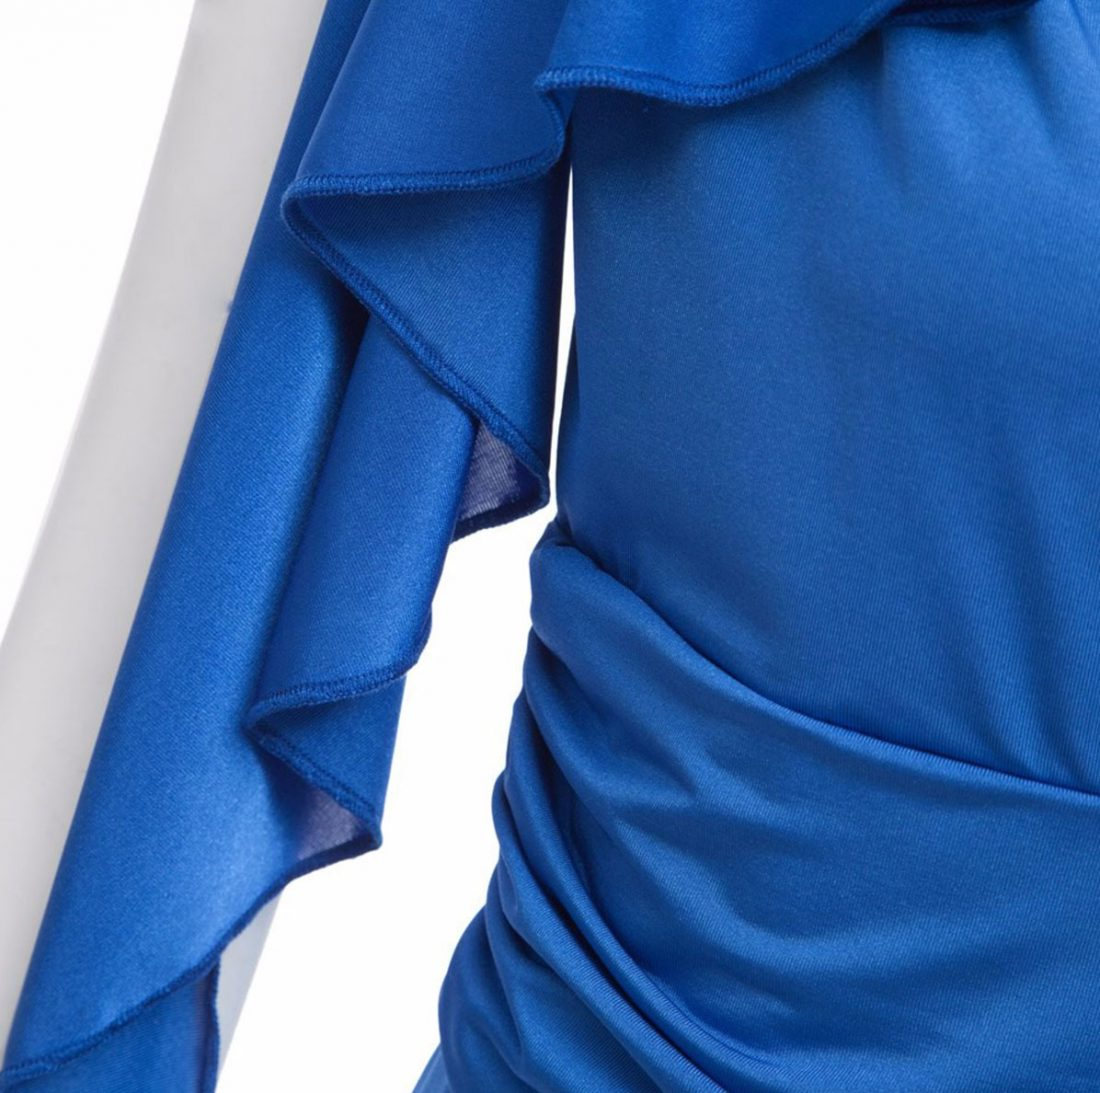 M0188 blue6 Short Sleeve Dresses maureens.com boutique